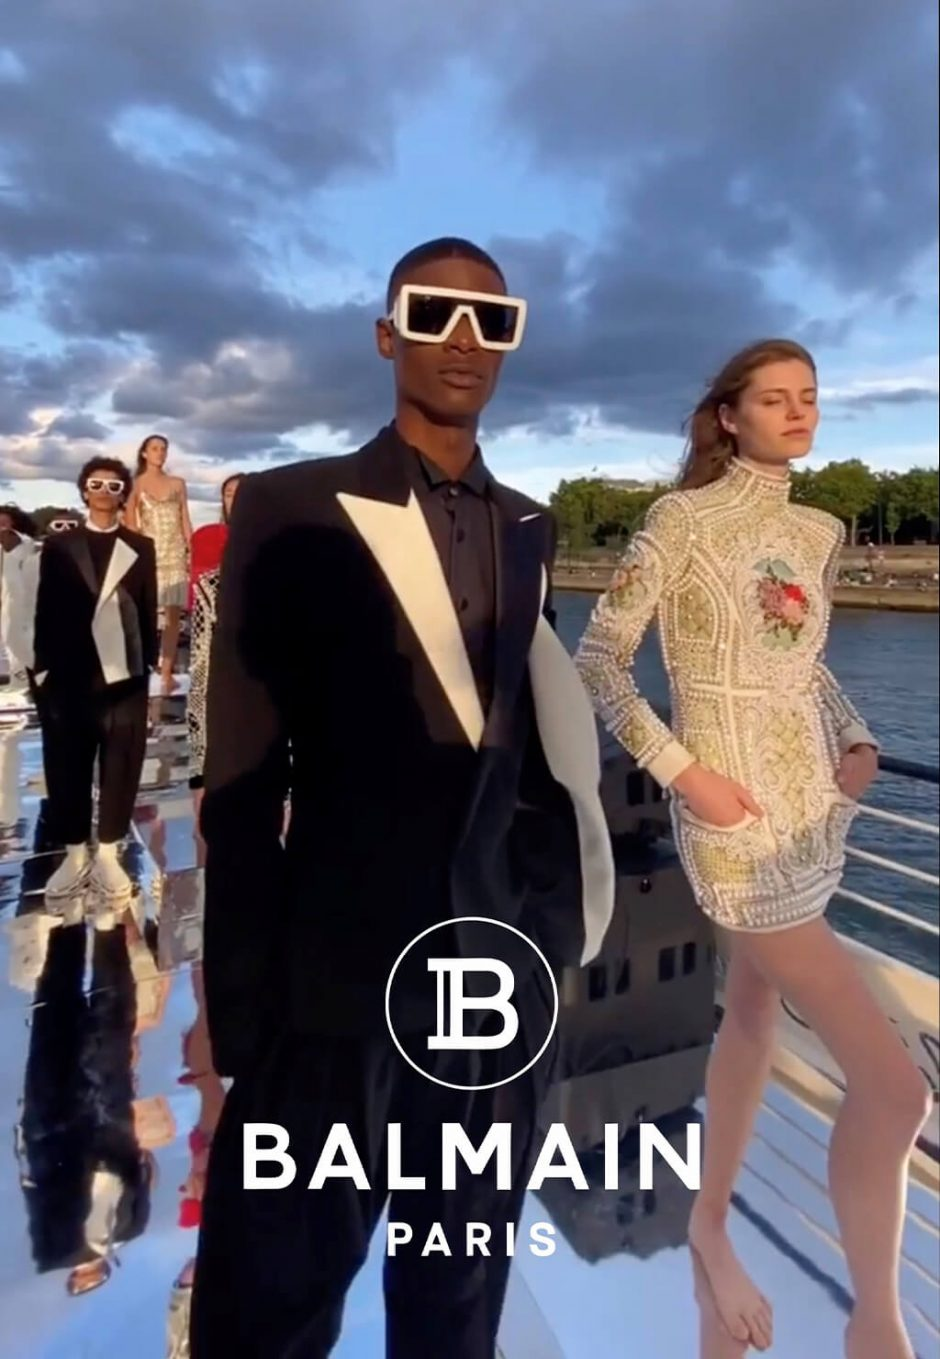 Rachide Balmain - Julho 20201